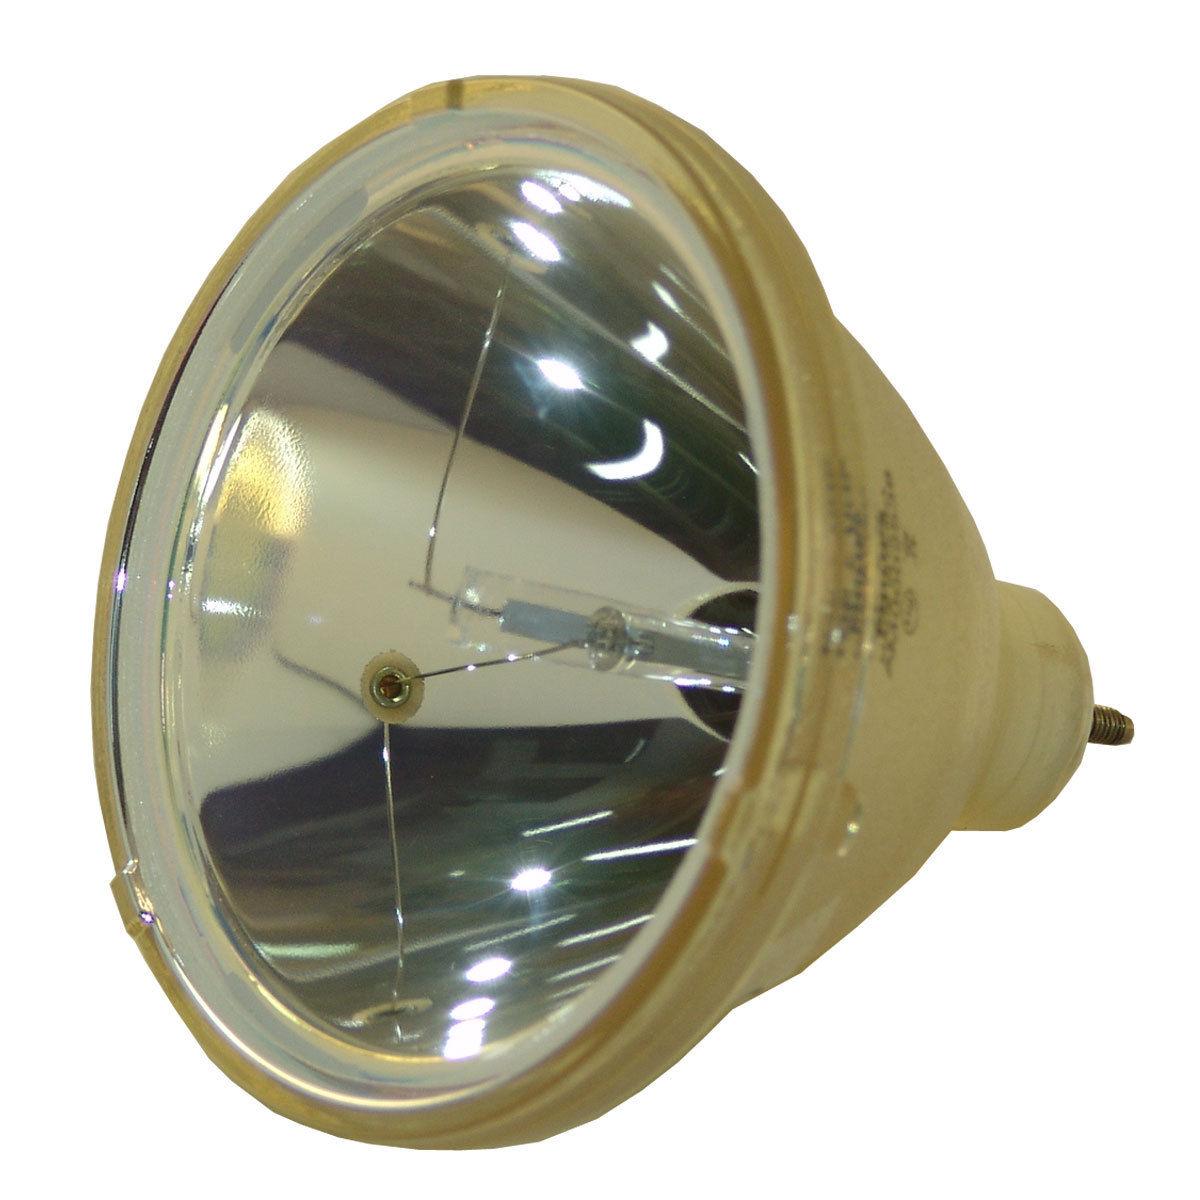 POA-LMP18 LMP18 610-279-5417 for SANYO PLC-XP07 PLC-SP20 PLC-XP10A PLC-XP10BA PLC-XP10EA PLC-XP10NA Projector Lamp Bulb replacement projector lamp bulb poa lmp18 for sanyo plc xp07 pcl sp20 plc xp10na projectors etc